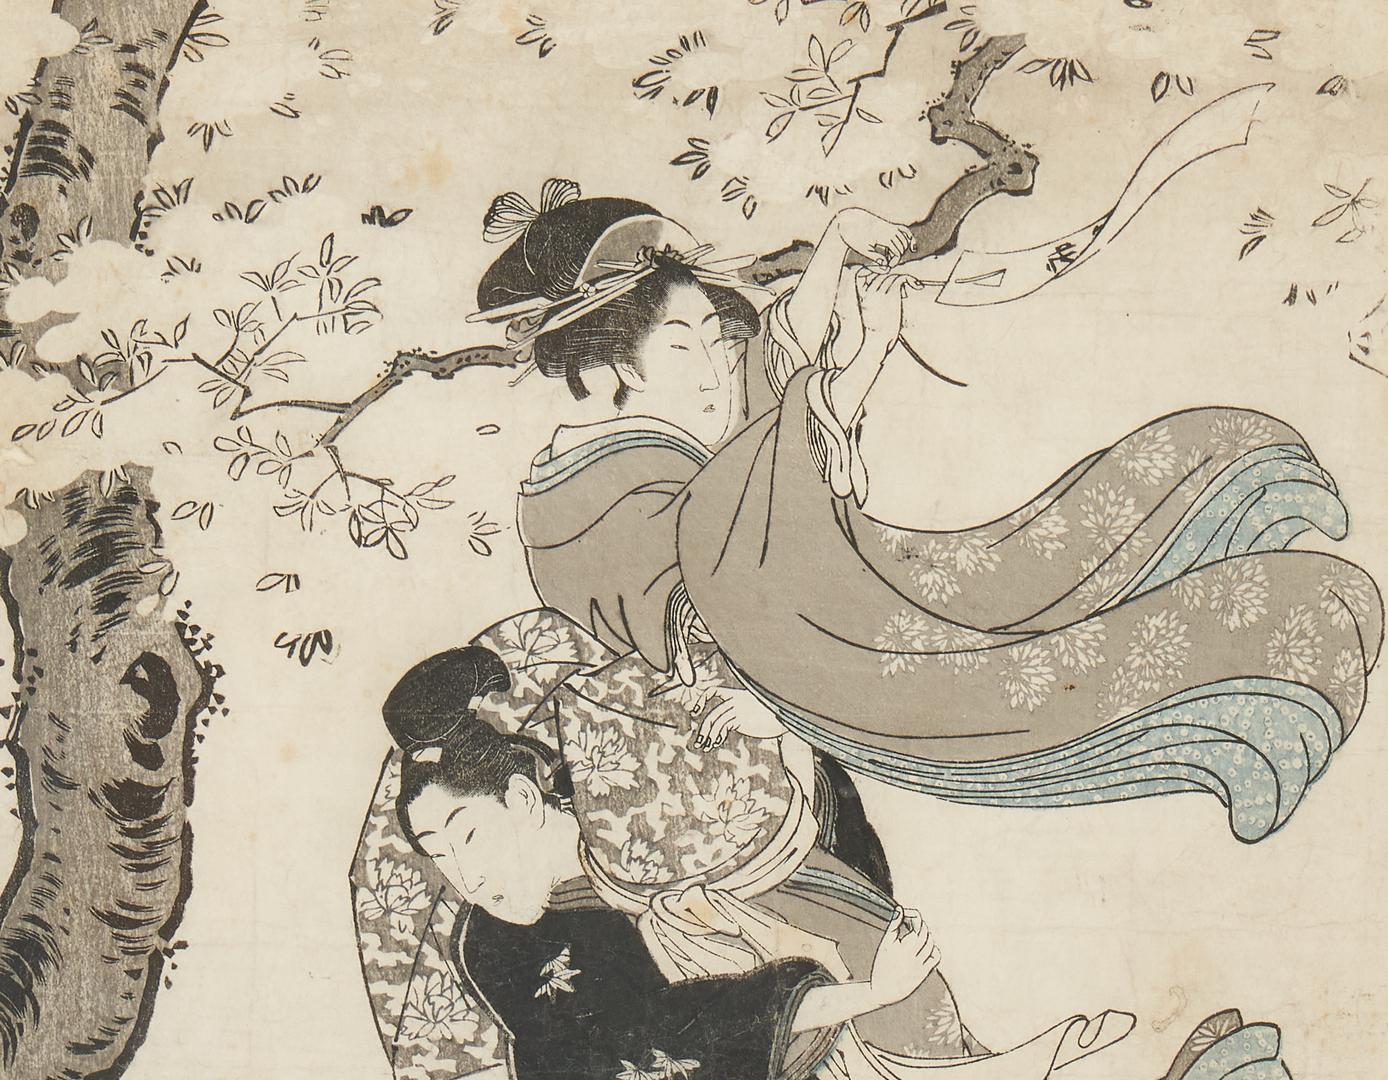 Lot 402: 4 Japanese Woodblock Prints, incl. Hiroshi Yoshida